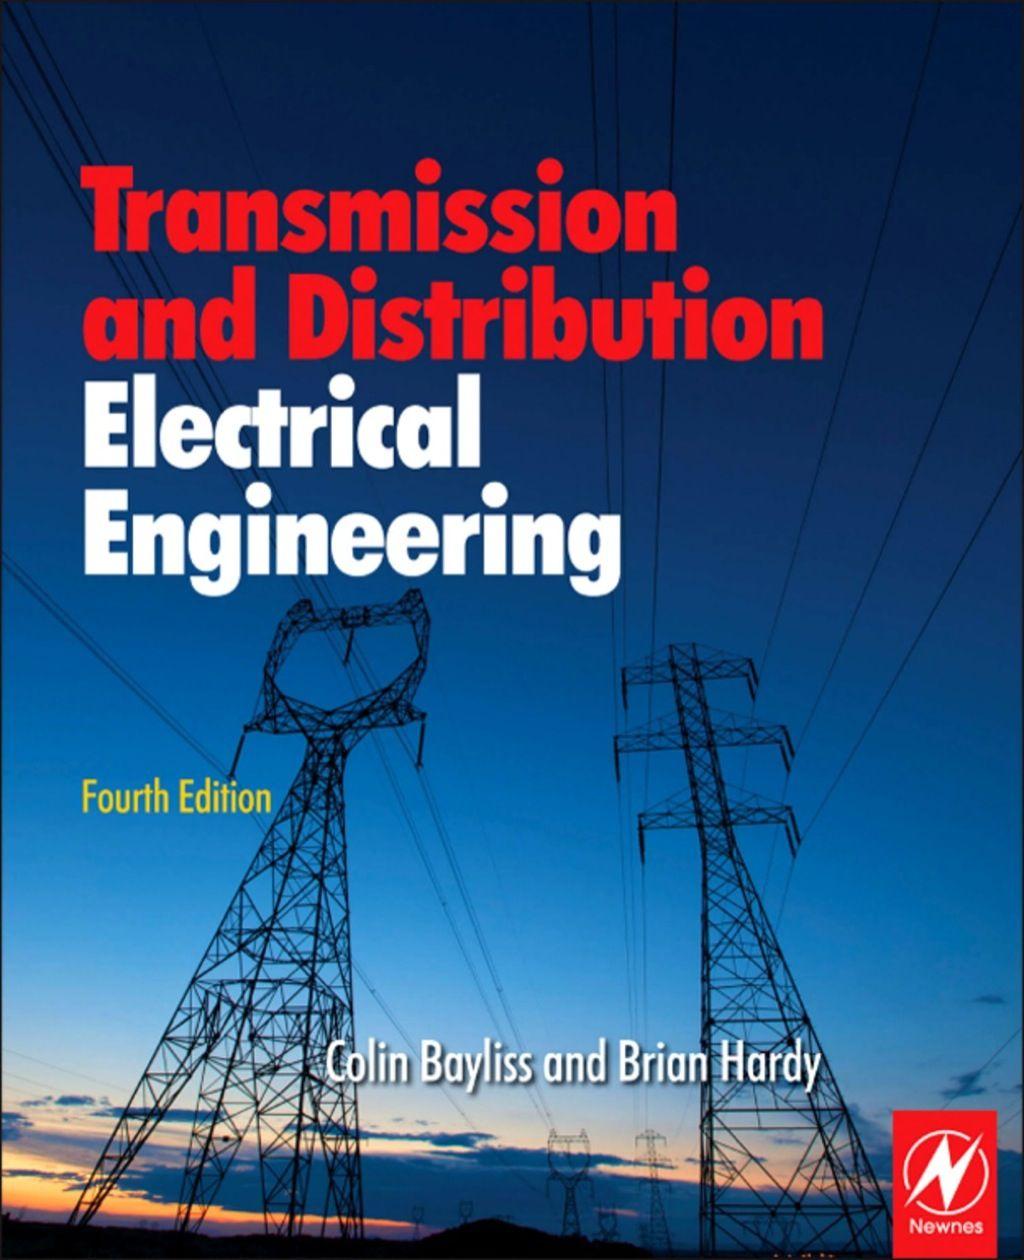 25+ Construction management books uk ideas